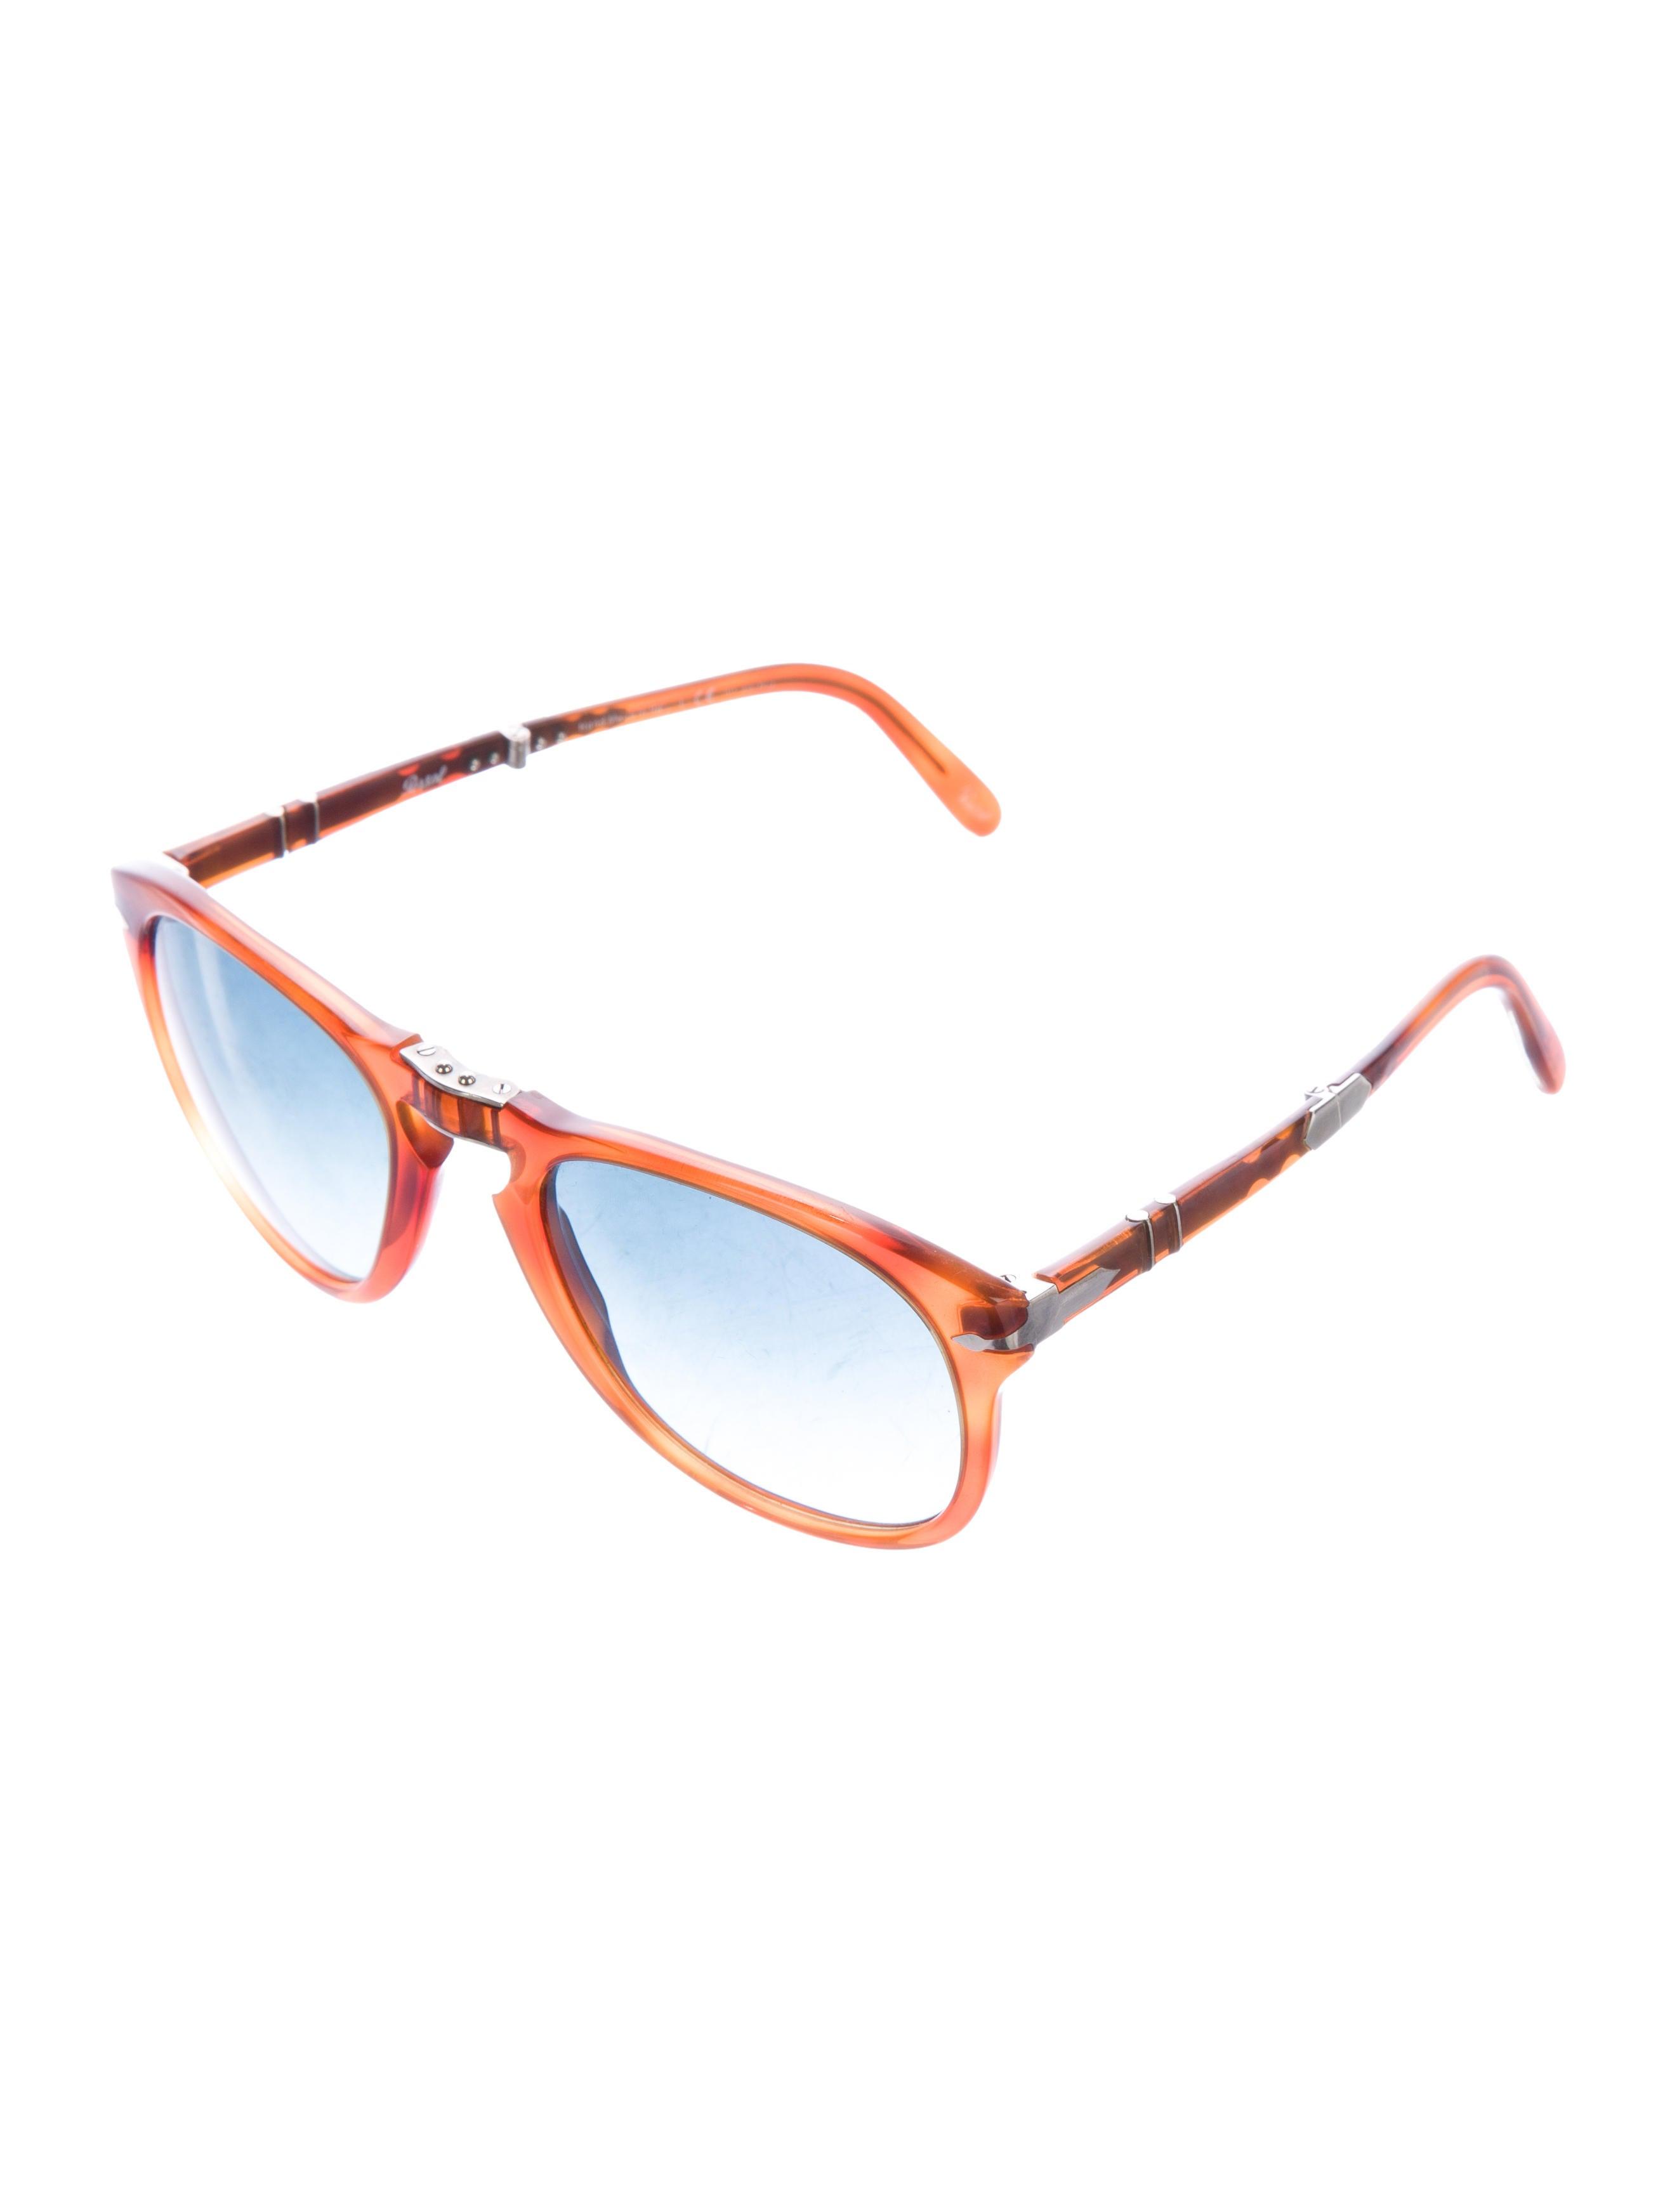 530c370e052 Persol Steve Mcqueen Folding Sunglasses Tortoise   Polarized ...